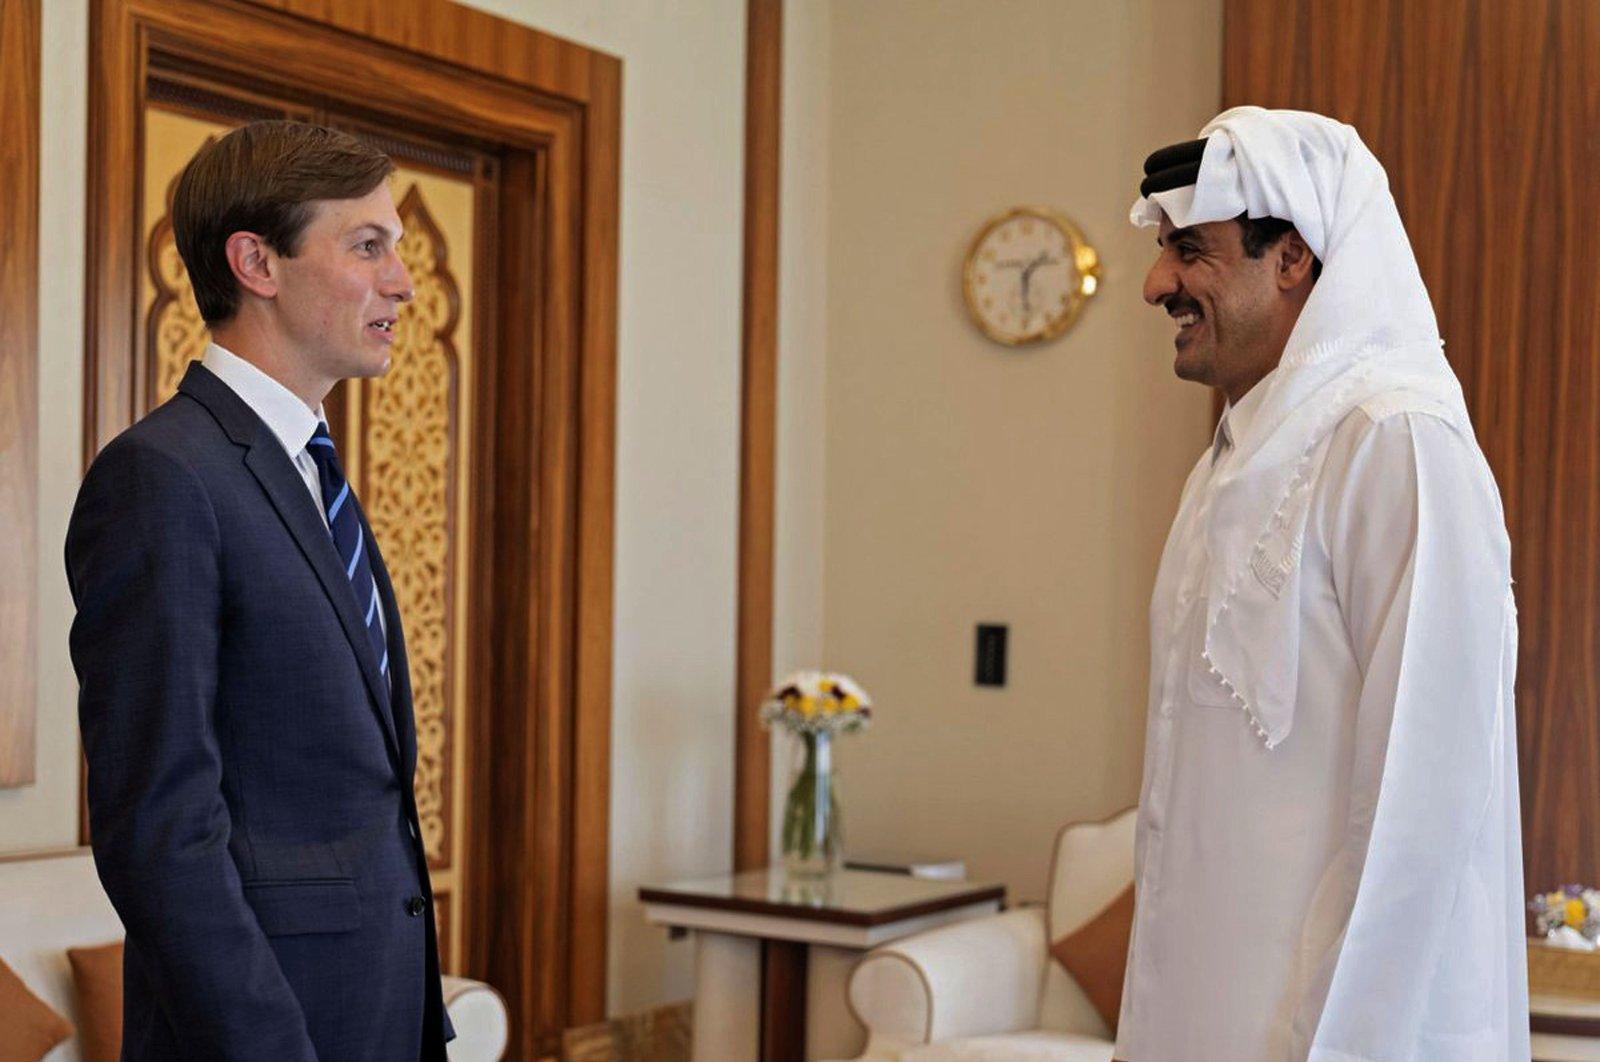 Senior adviser to the U.S. president Jared Kushner (L) meets with Qatar's ruler Emir Sheikh Tamim bin Hamad Al Thani in this handout photo released by the Qatar News Agency (QNA), Doha, Qatar, Sept. 2, 2020. (Qatar News Agency via AFP)